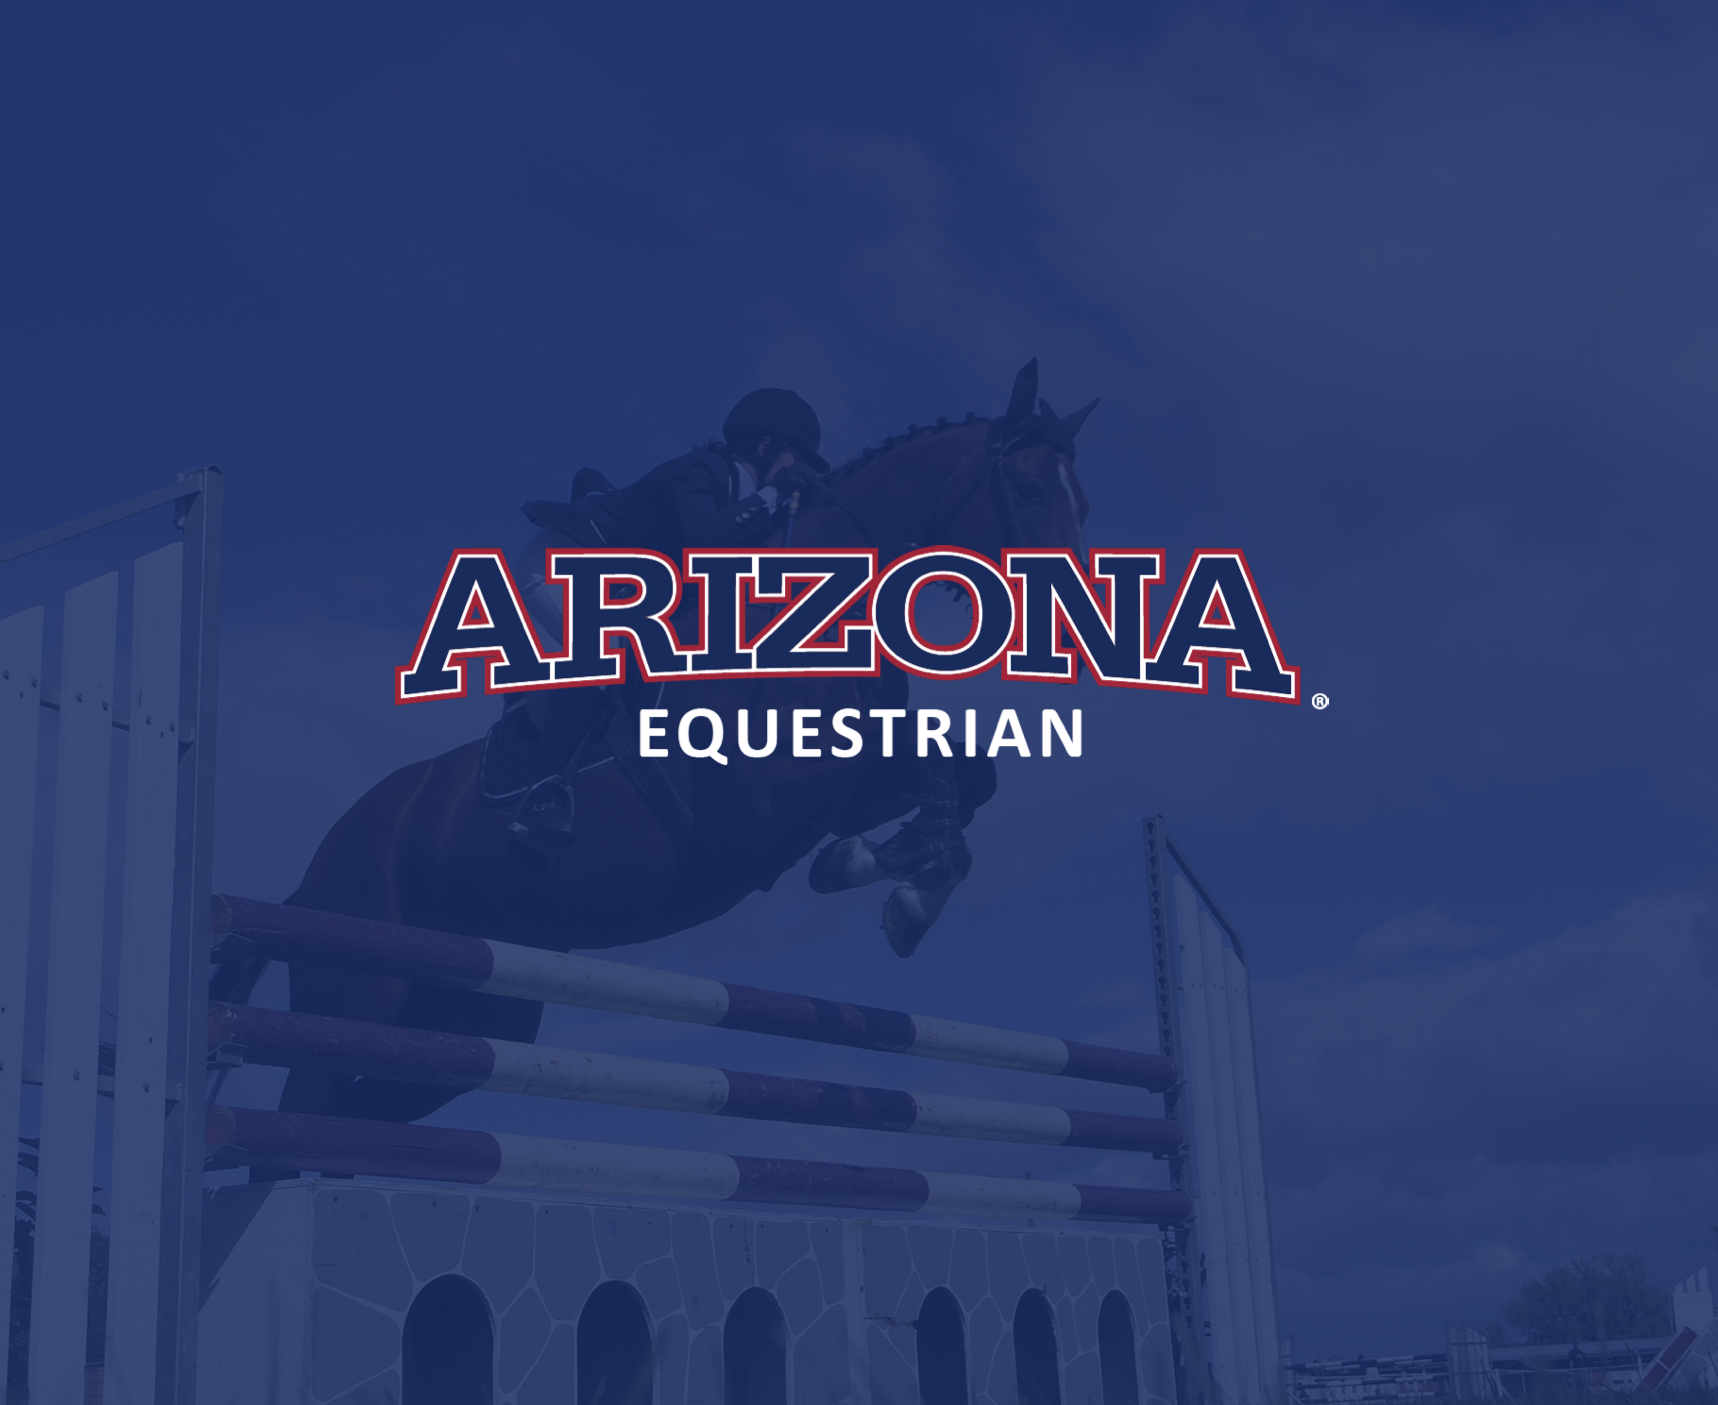 arizona club sports equestrian